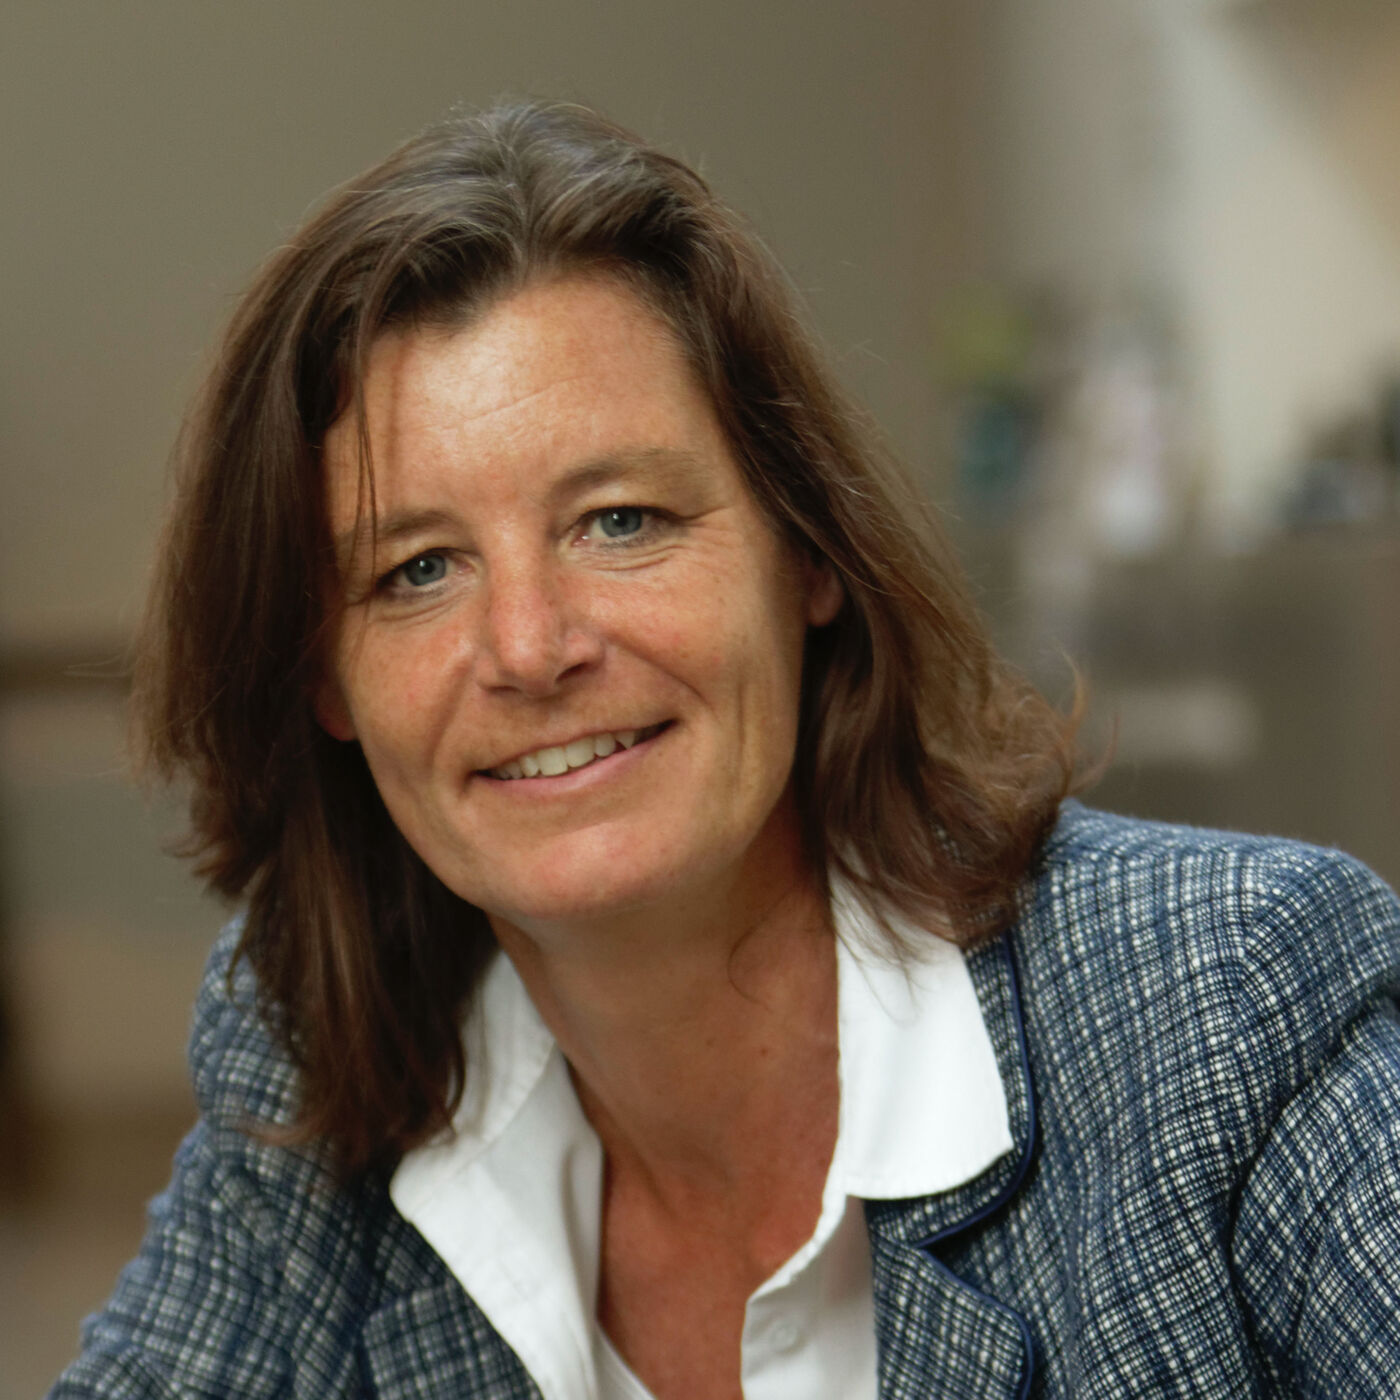 Gemma Jelier, General Director of Korzo, on Cultural Management, Livestreams, and Art education   The Freelancer Talk #17